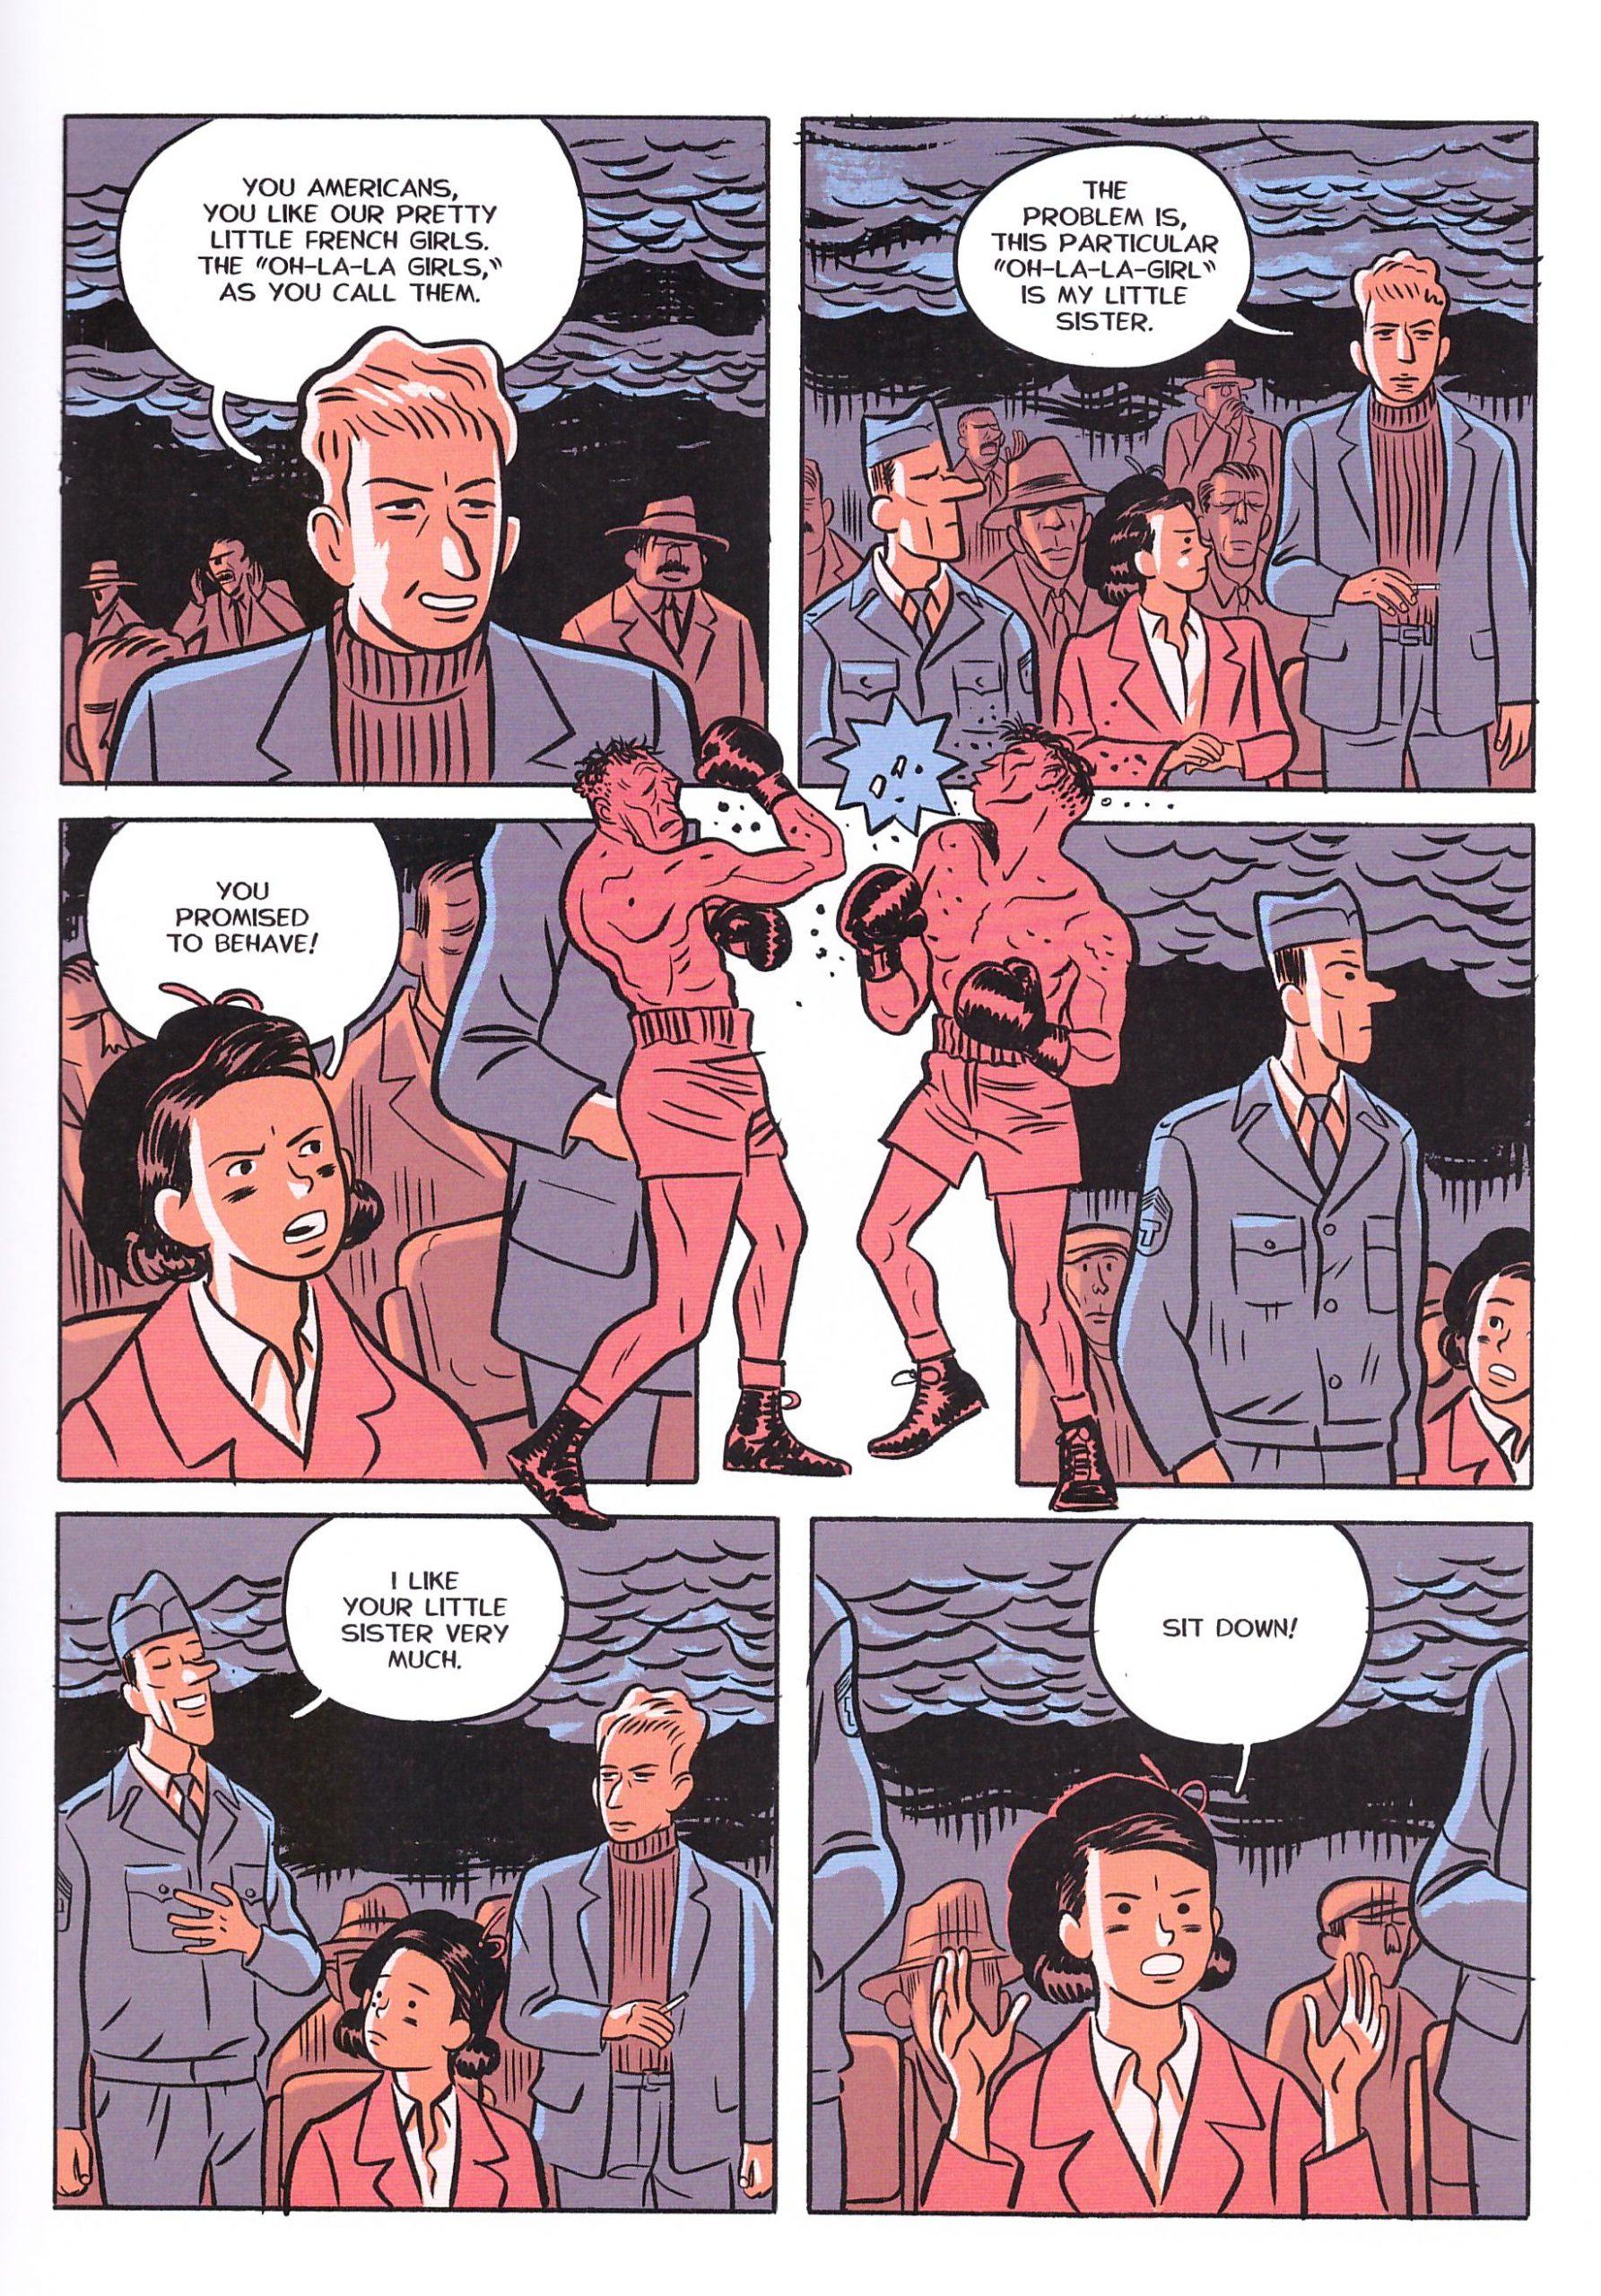 Michigan graphic novel review